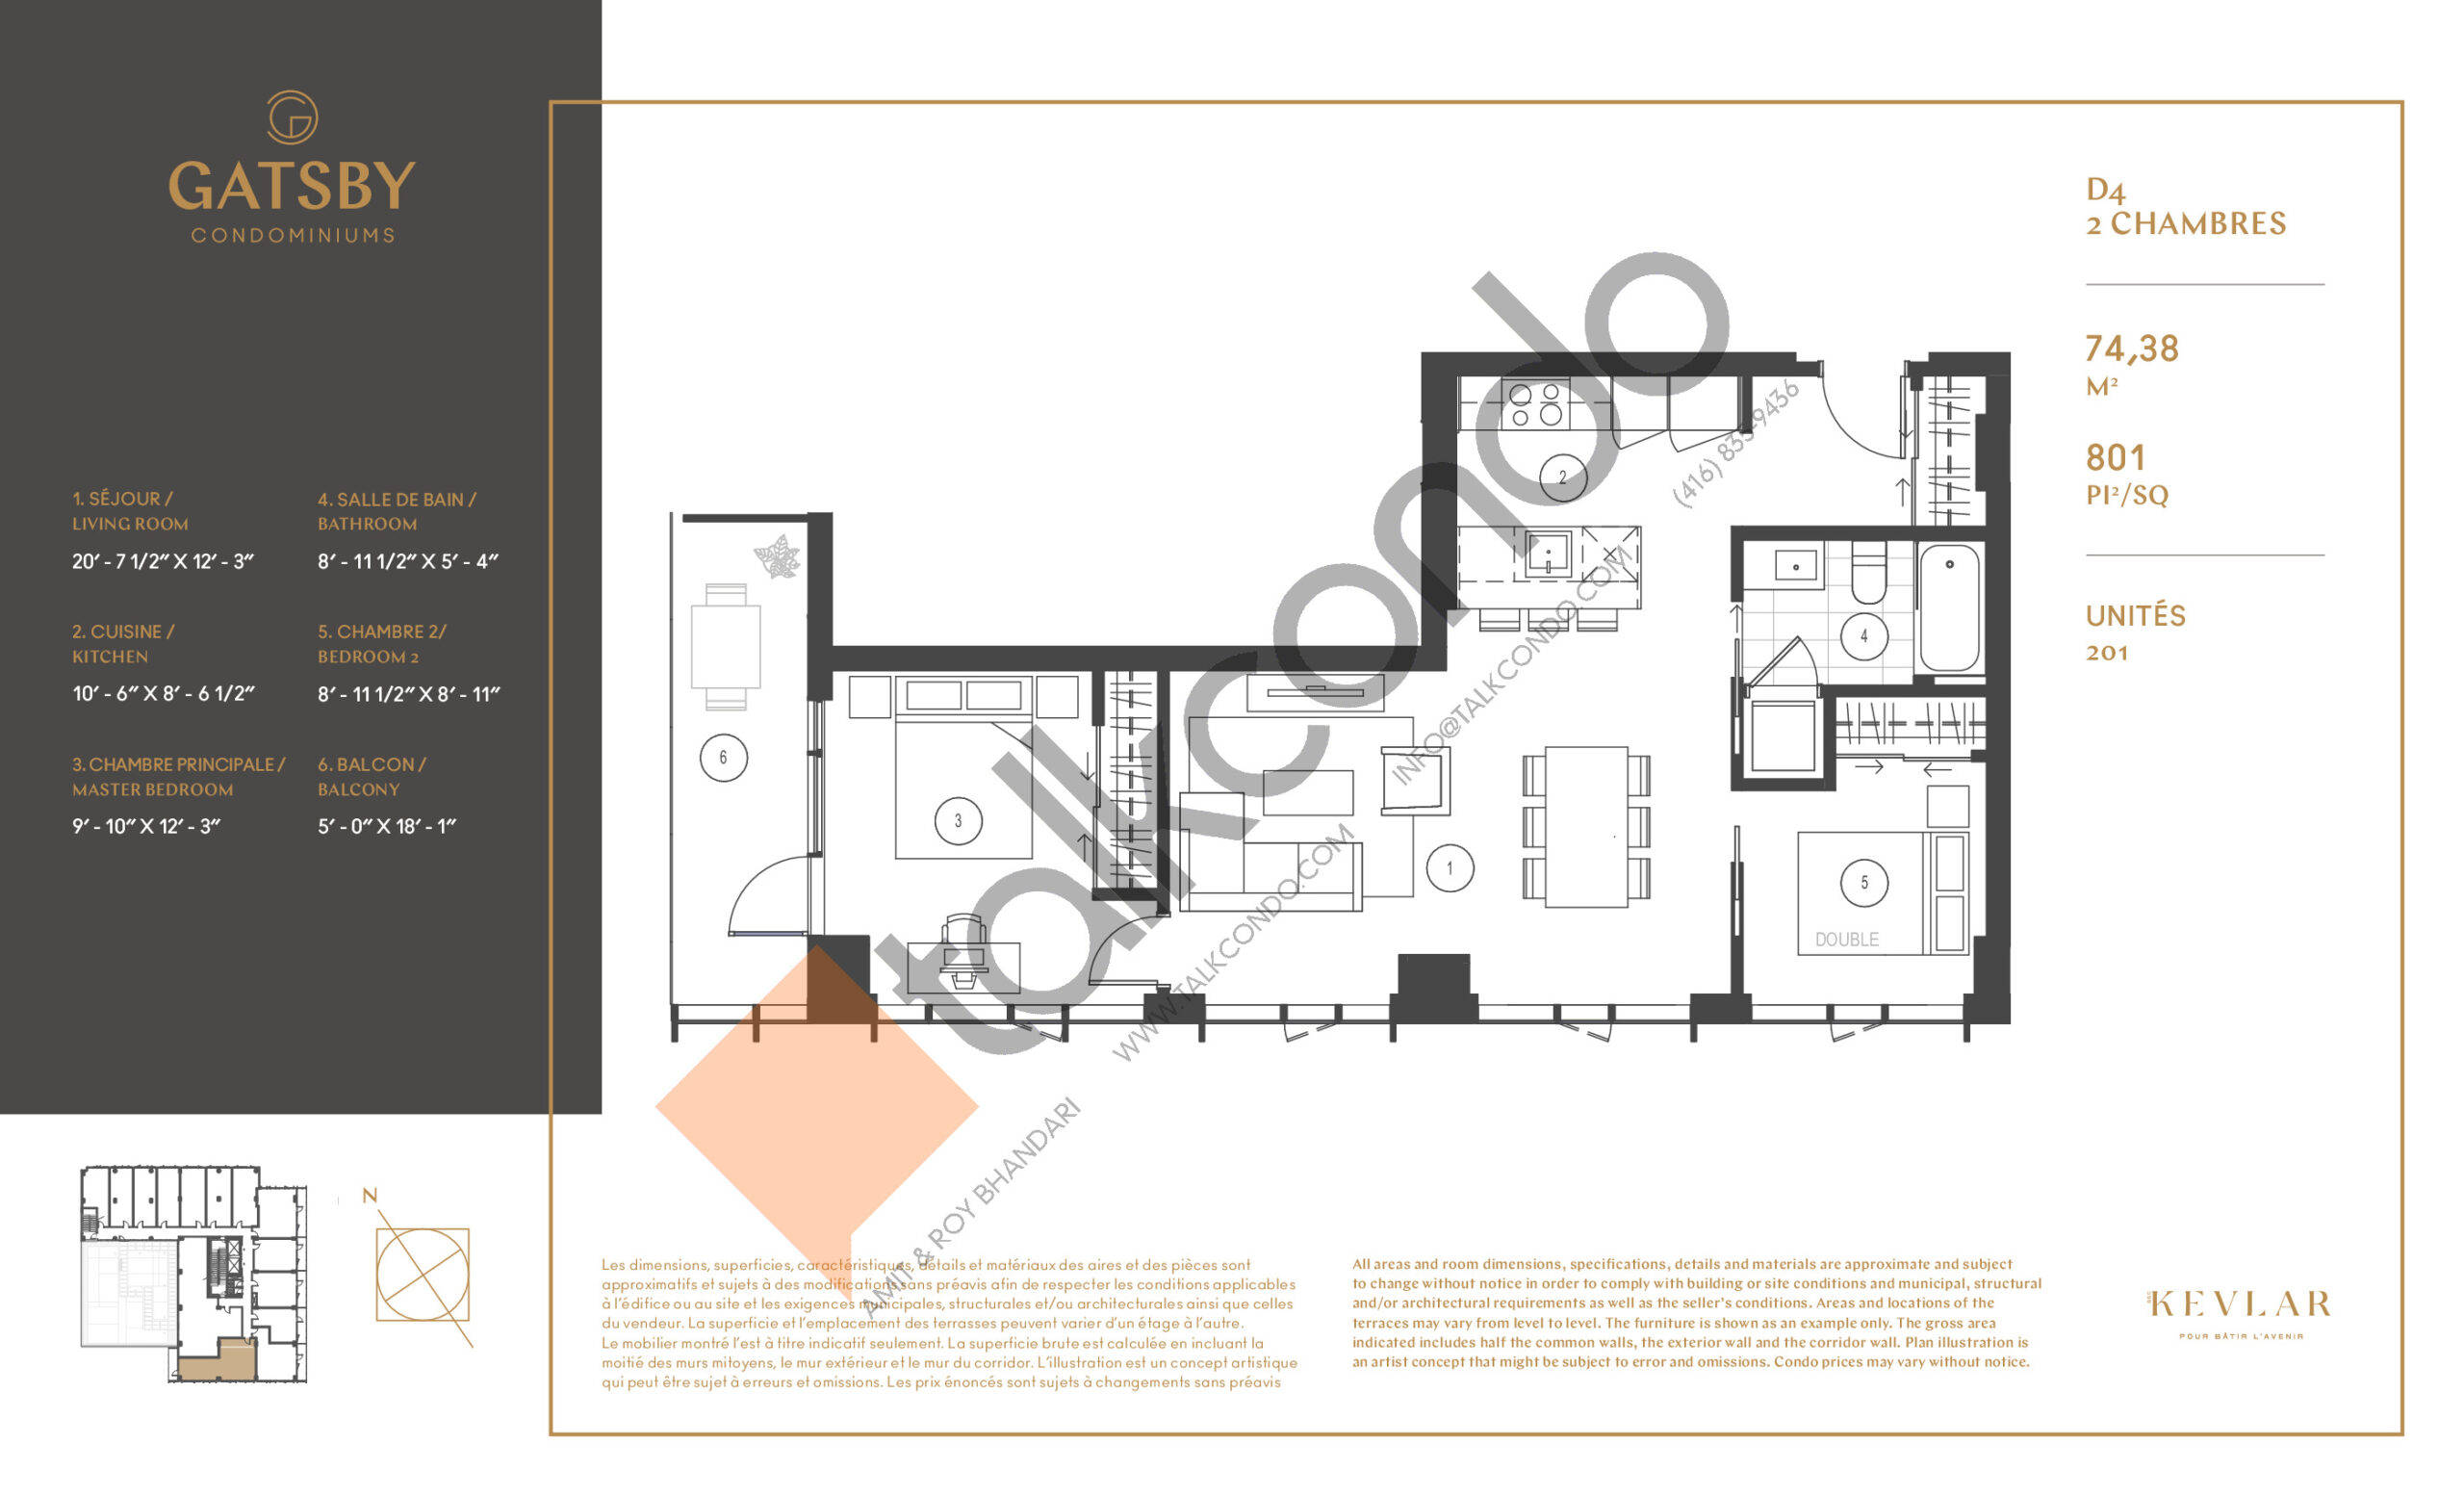 D4 Floor Plan at Gatsby Condos - 801 sq.ft